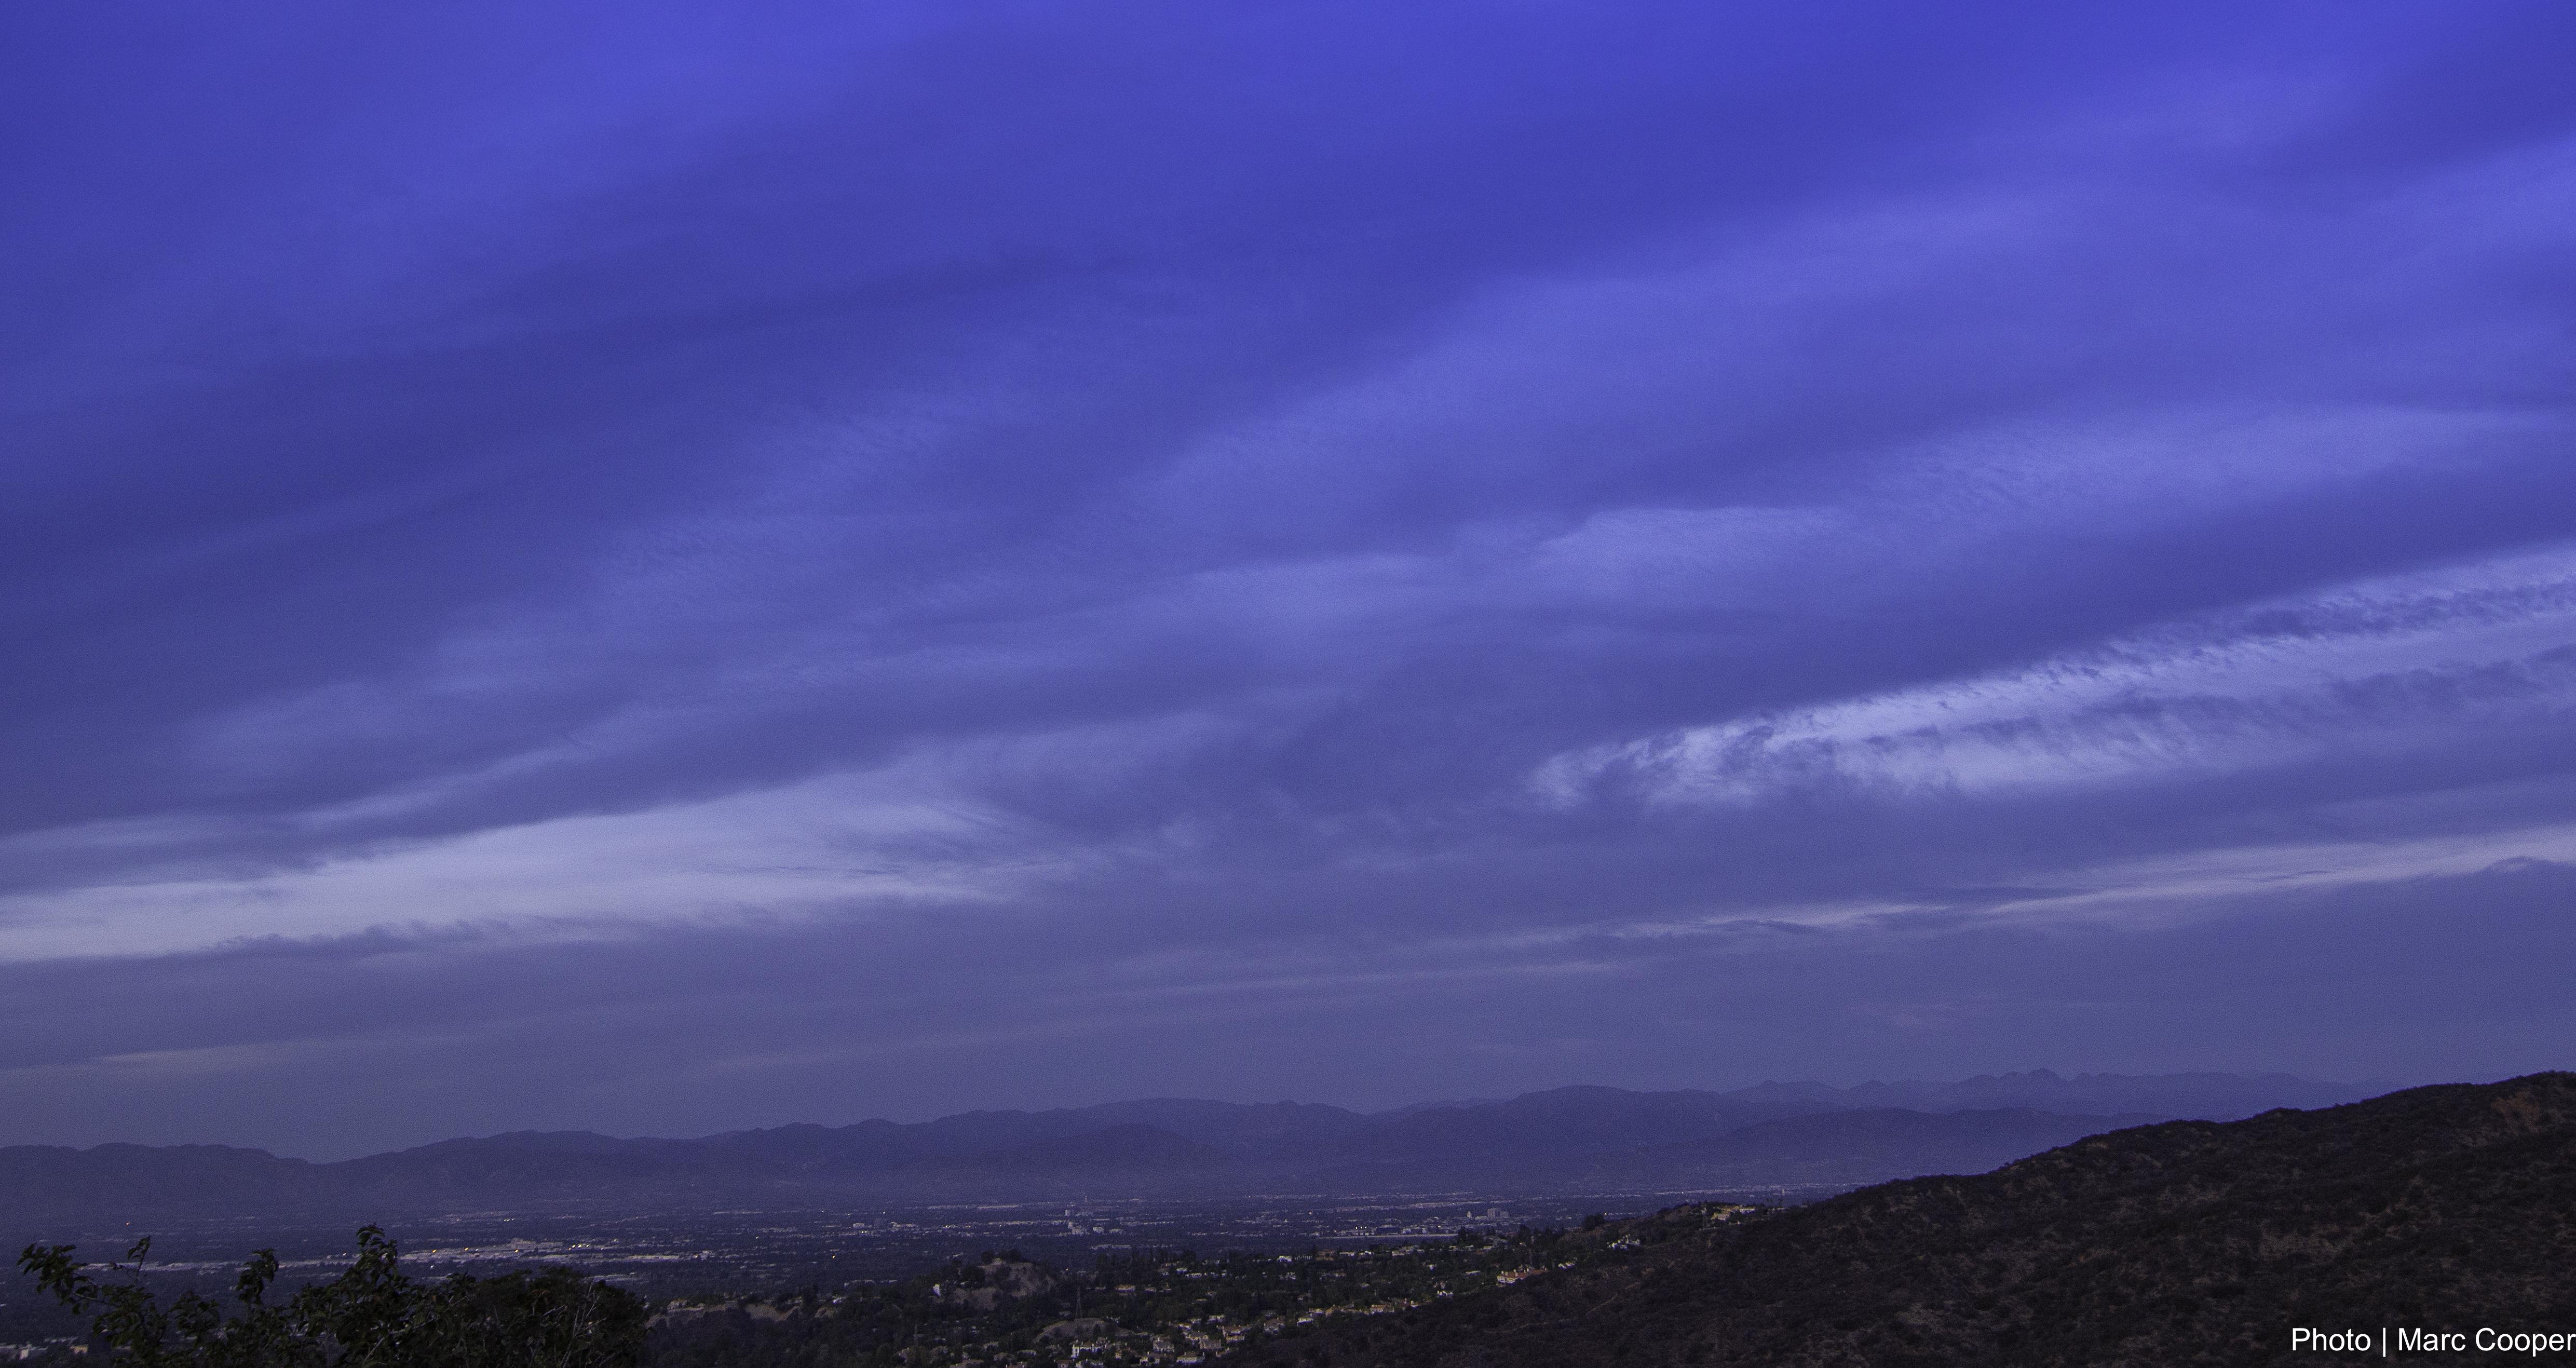 San Fernando Valley from Mulholland Dr, San fernando valley, Sky, Outdoor, Mountain, HQ Photo